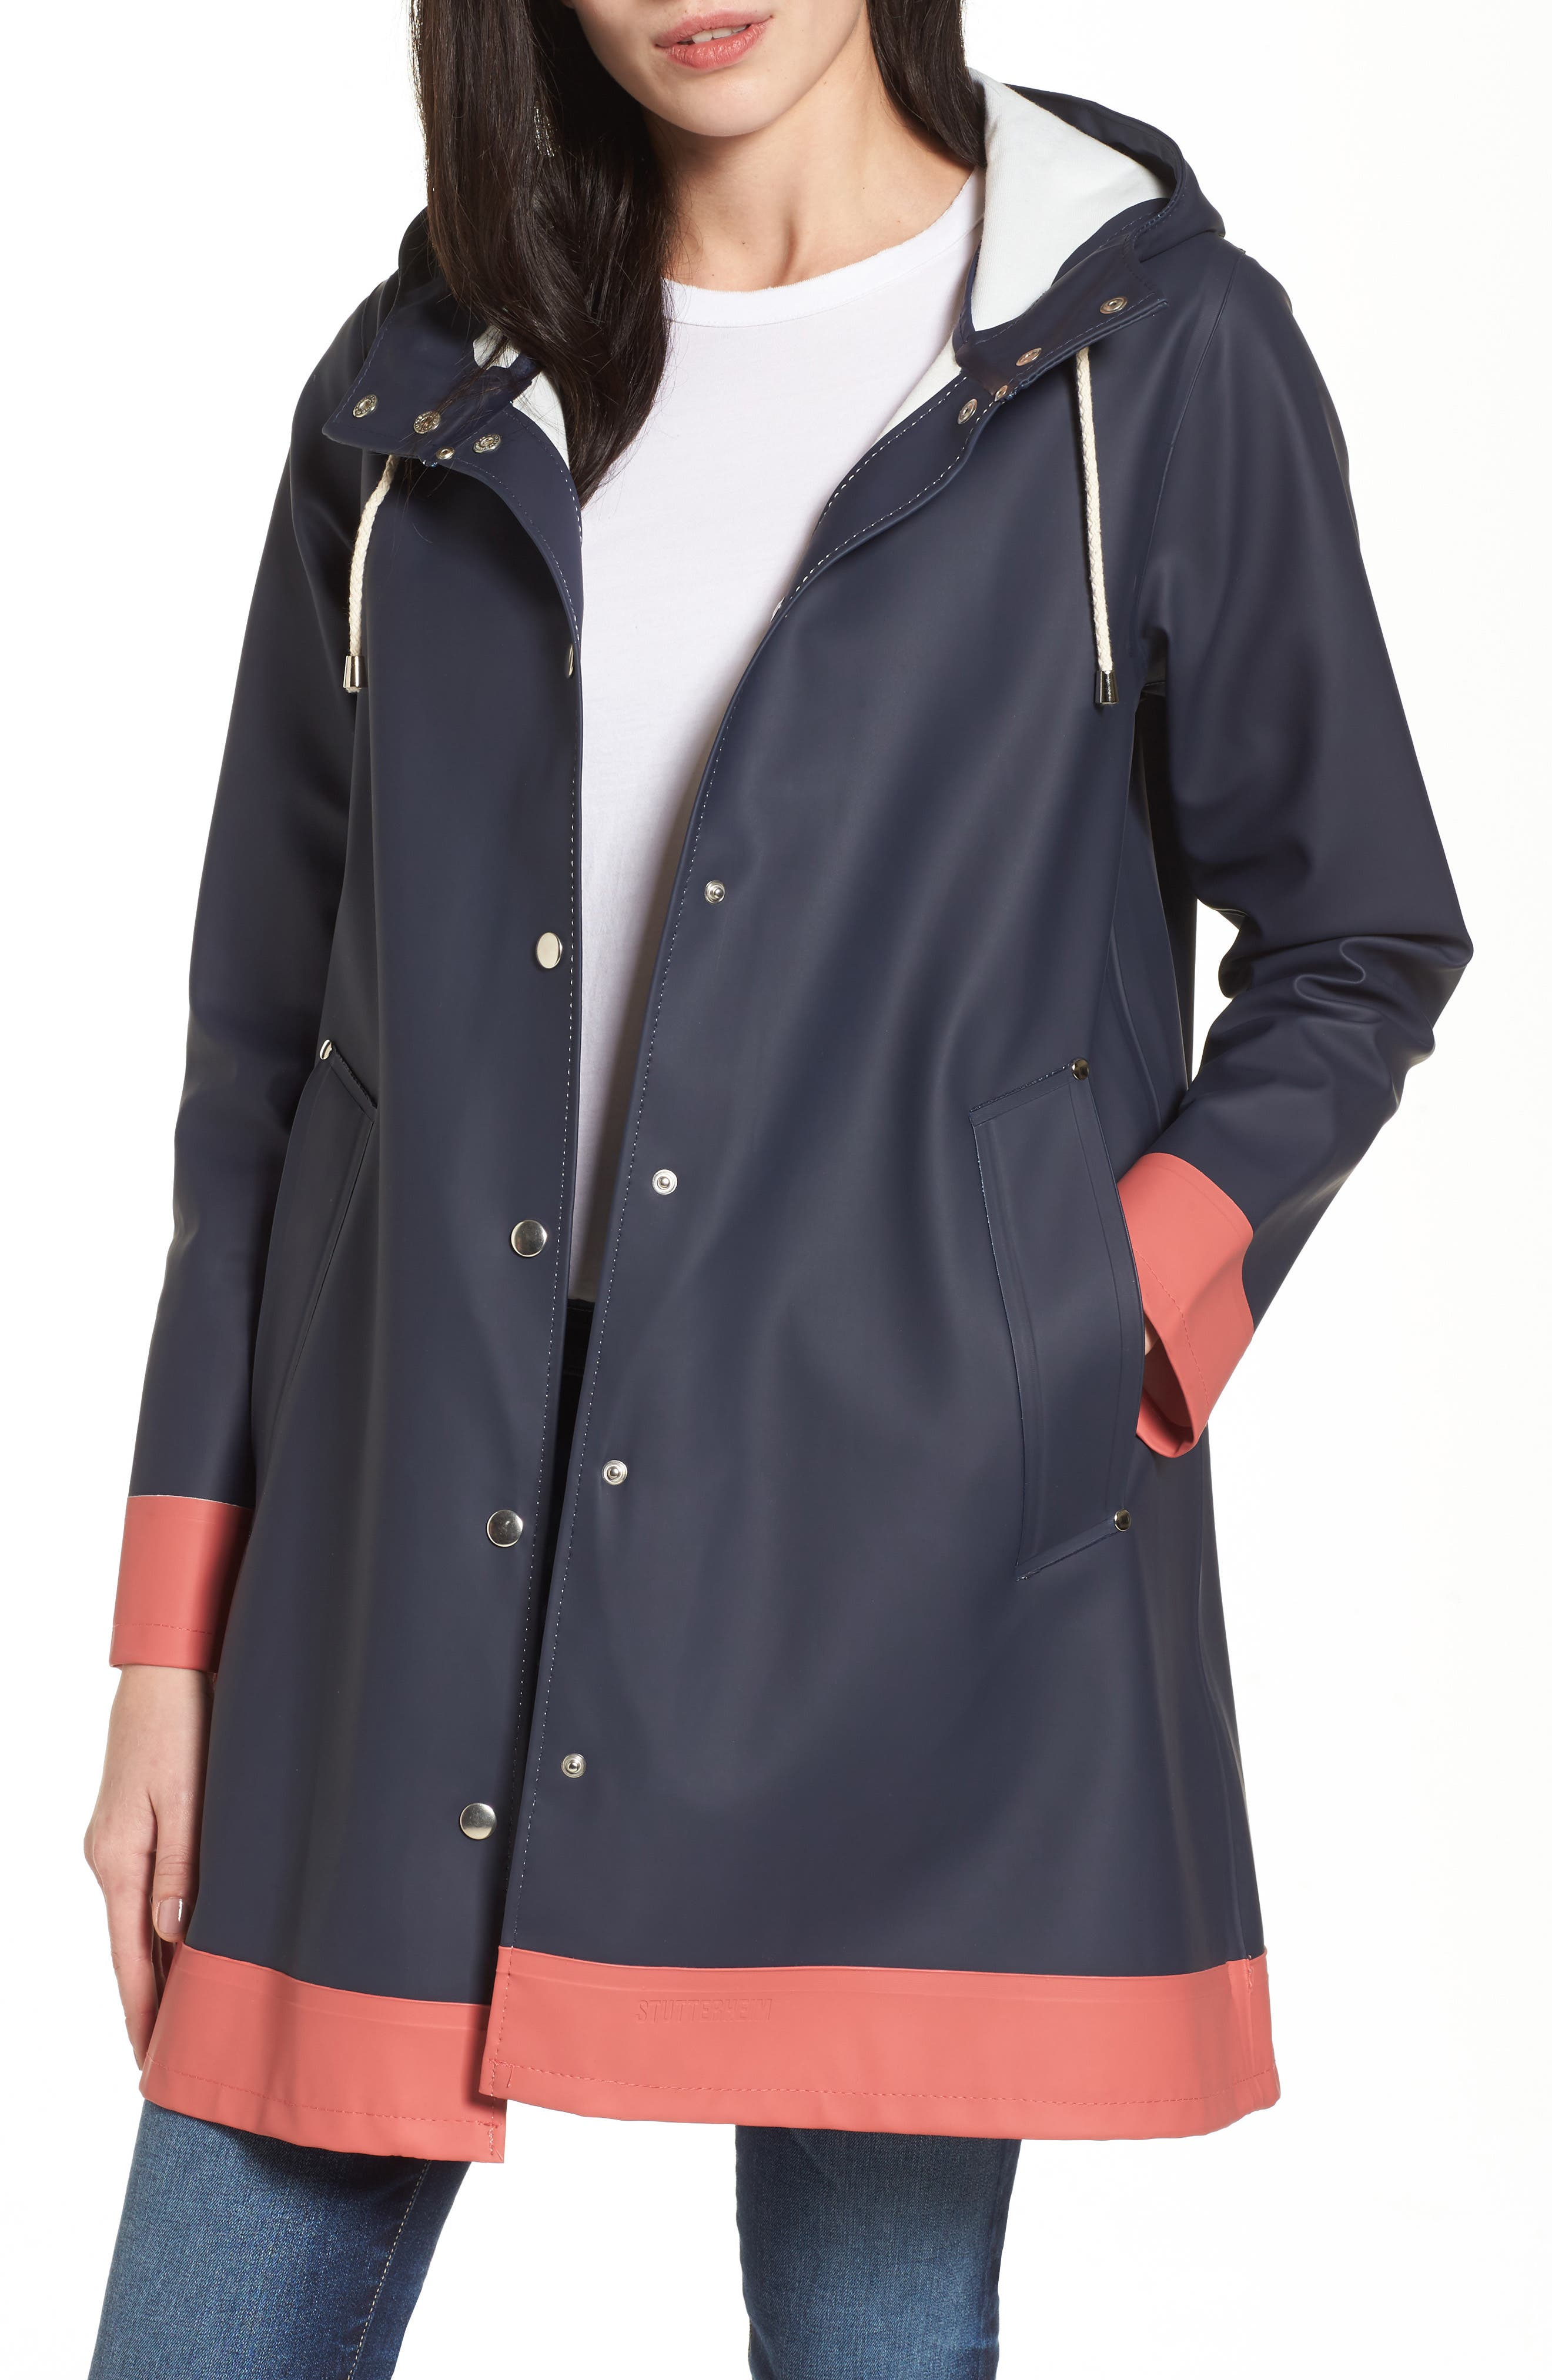 Mosebacke Frame Colorblock Raincoat,                             Main thumbnail 1, color,                             Navy/ Faded Rose